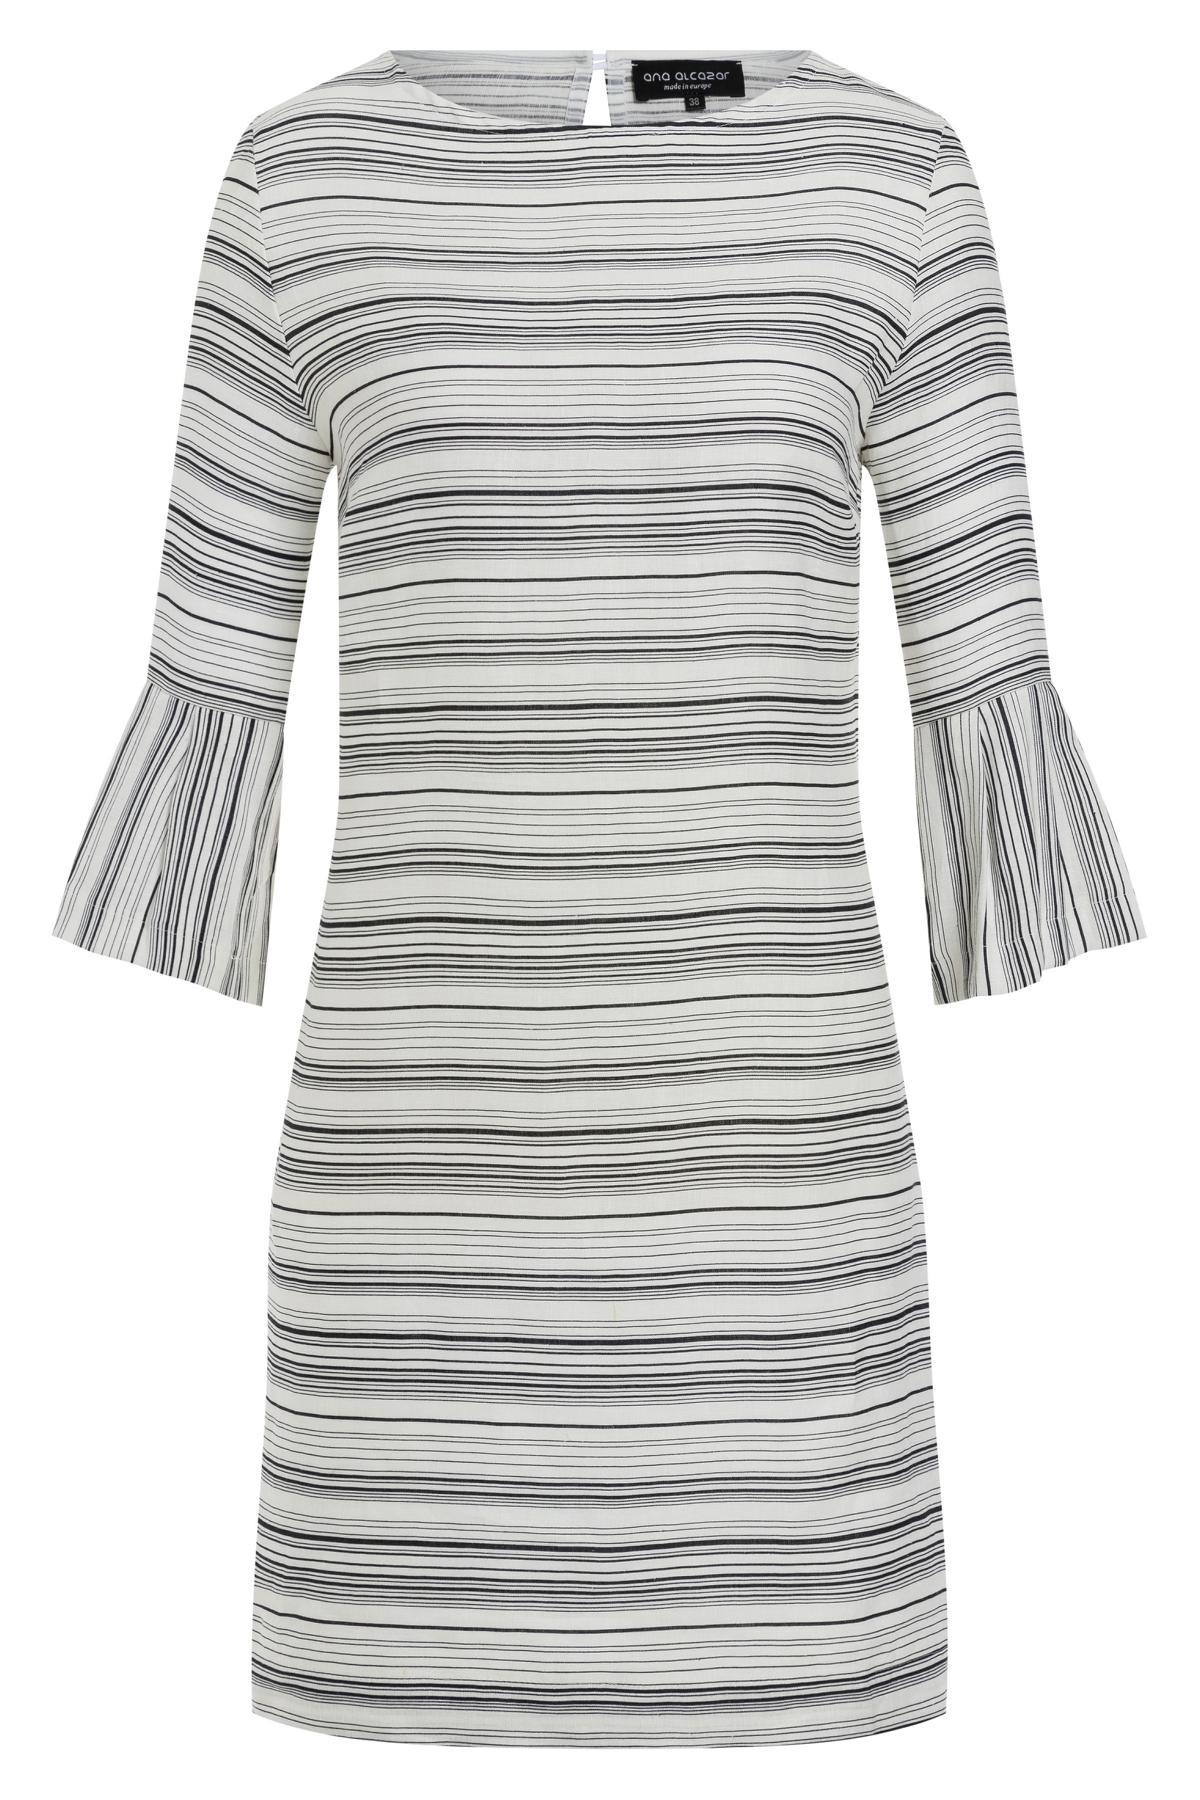 f3af188894a54b Wit linnen jurk Tokata met strepen